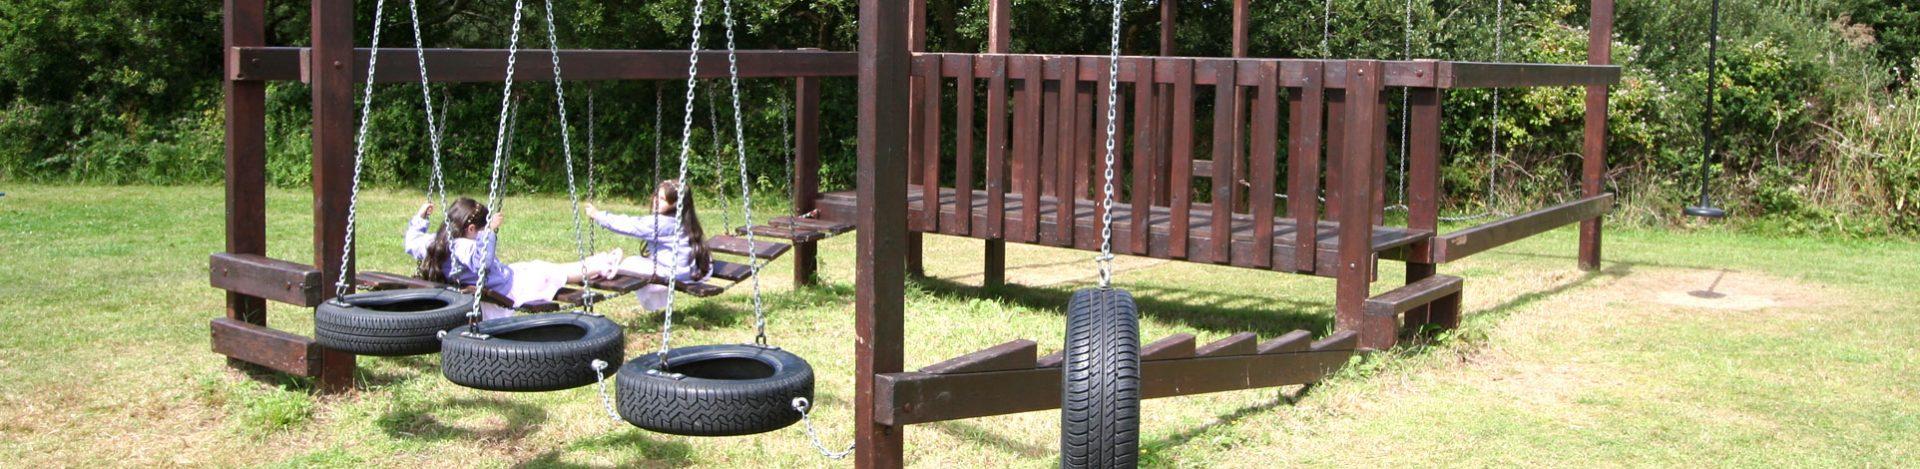 Holiday park play area